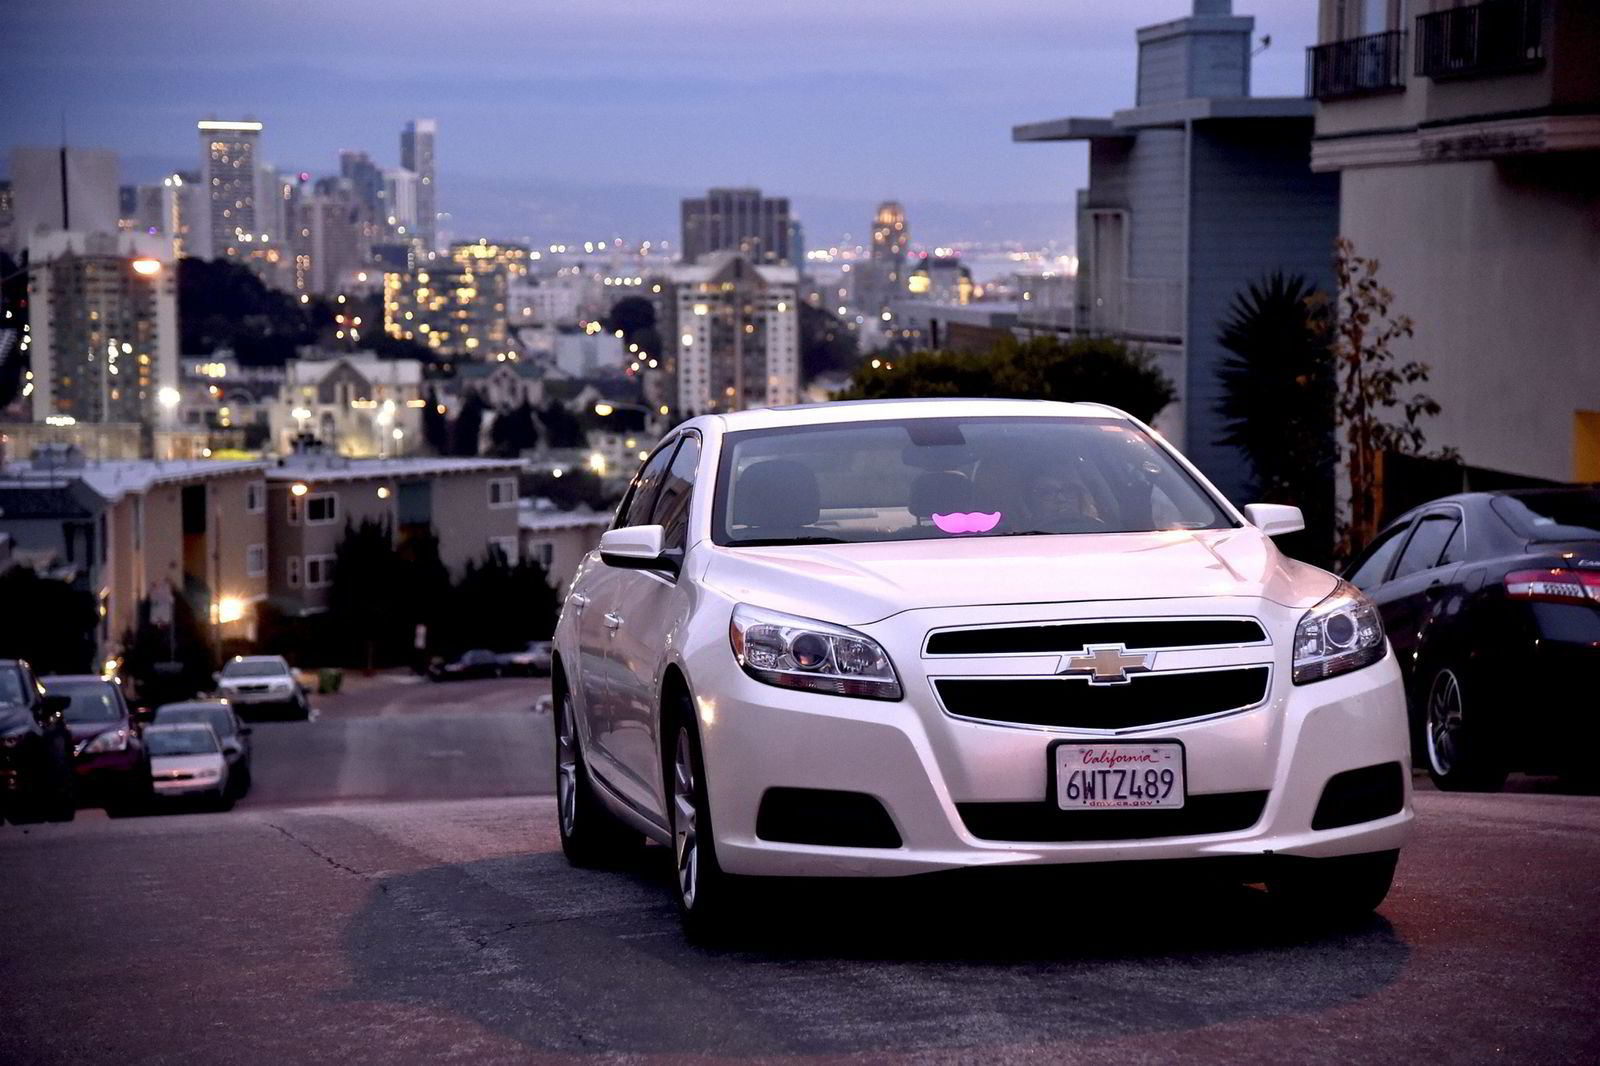 En Lyft-sjåfør, med den karakteristiske logoen på frontvinduet, venter på en kunde i San Francisco.